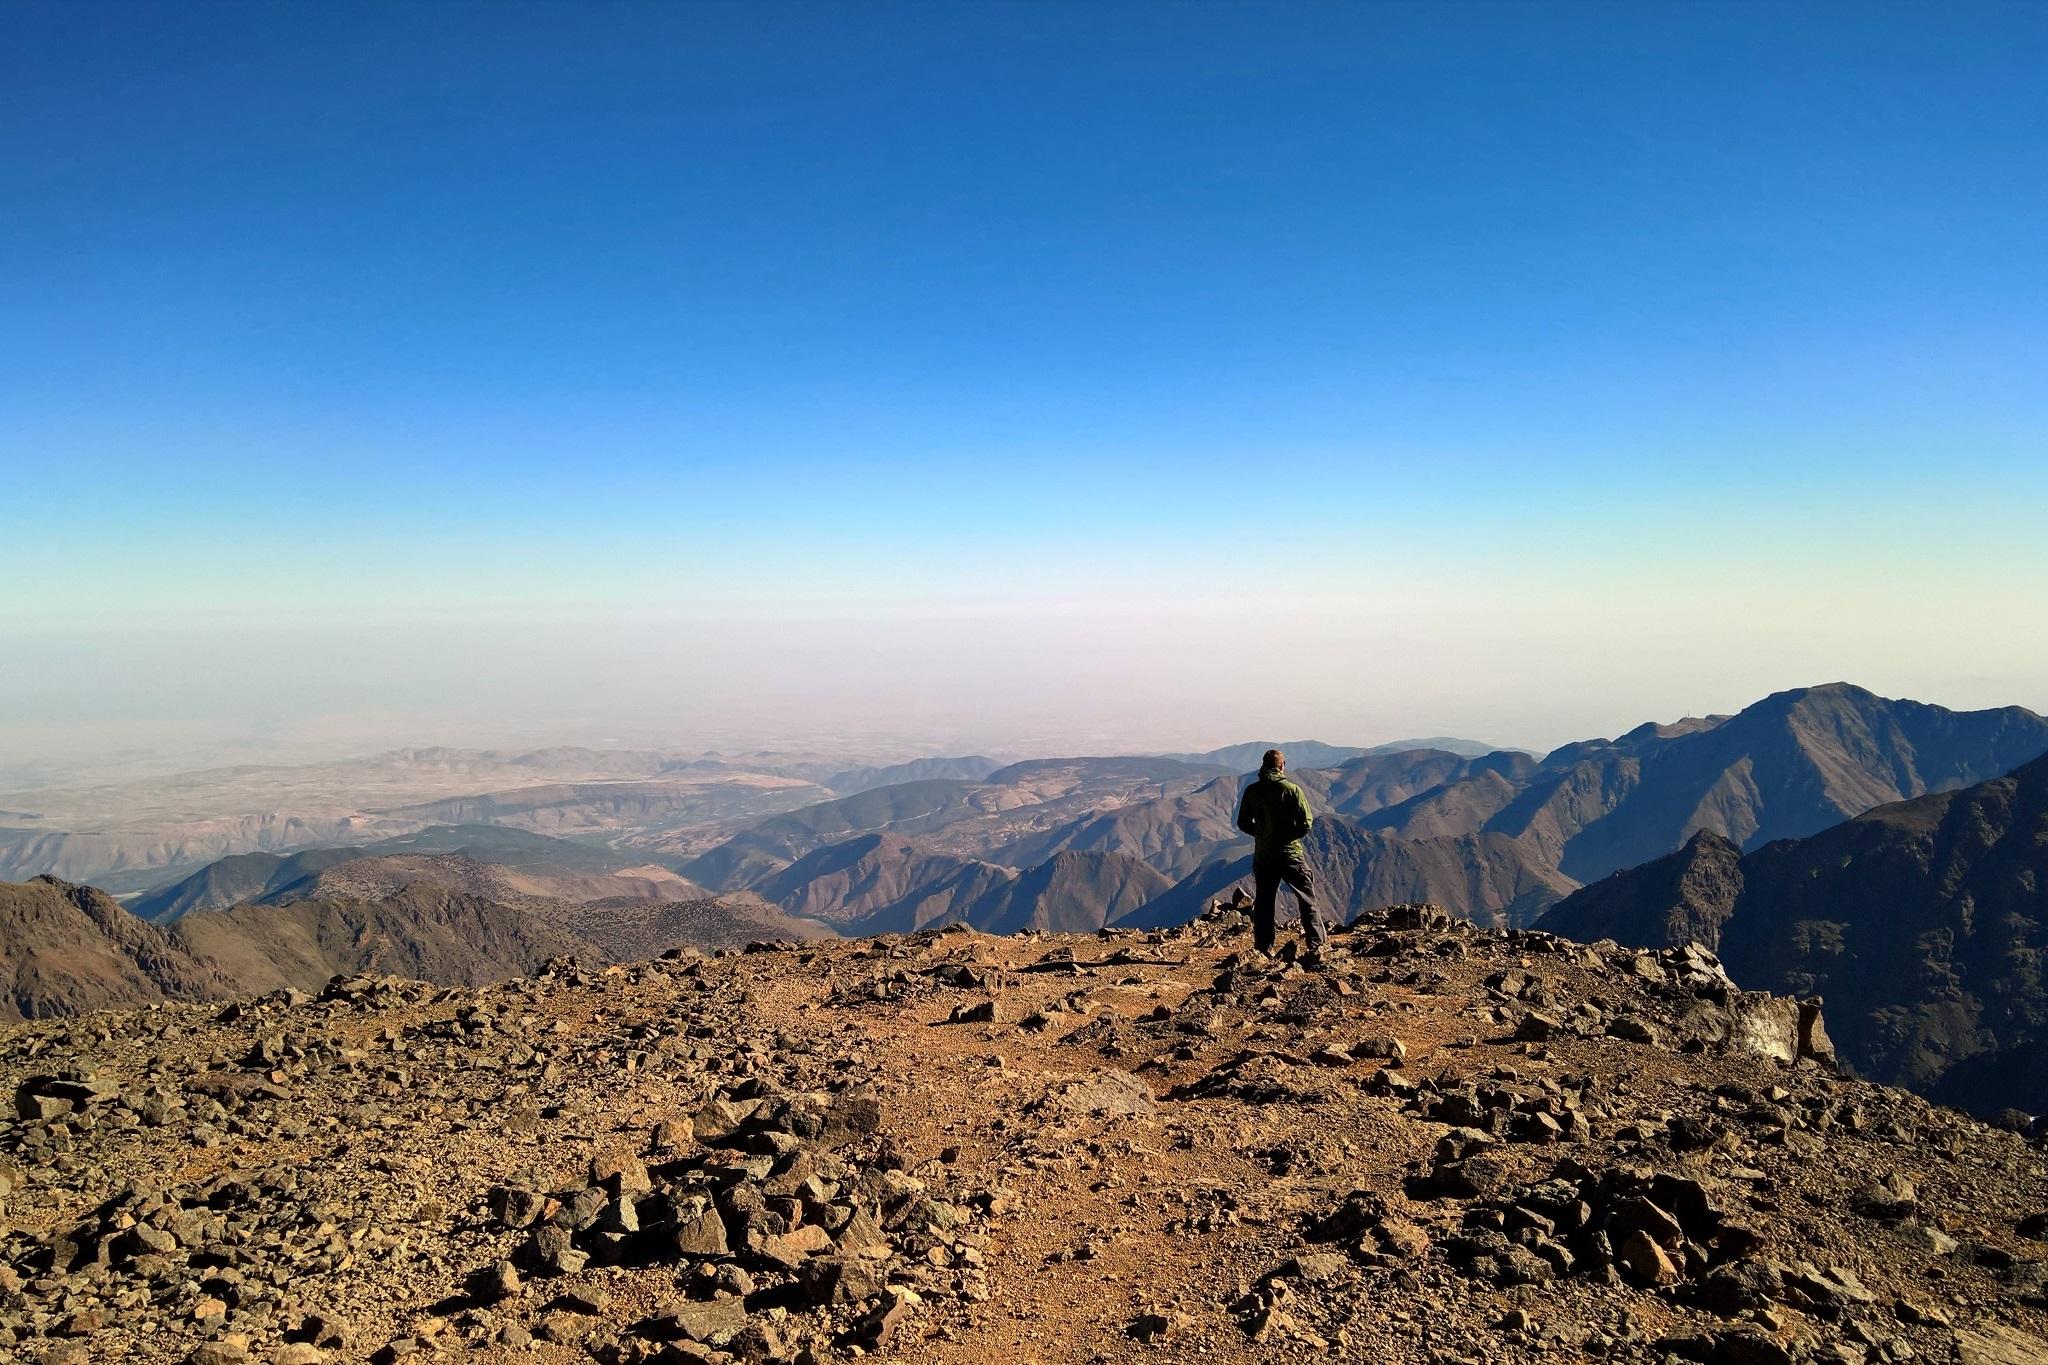 Trekking in Marocco